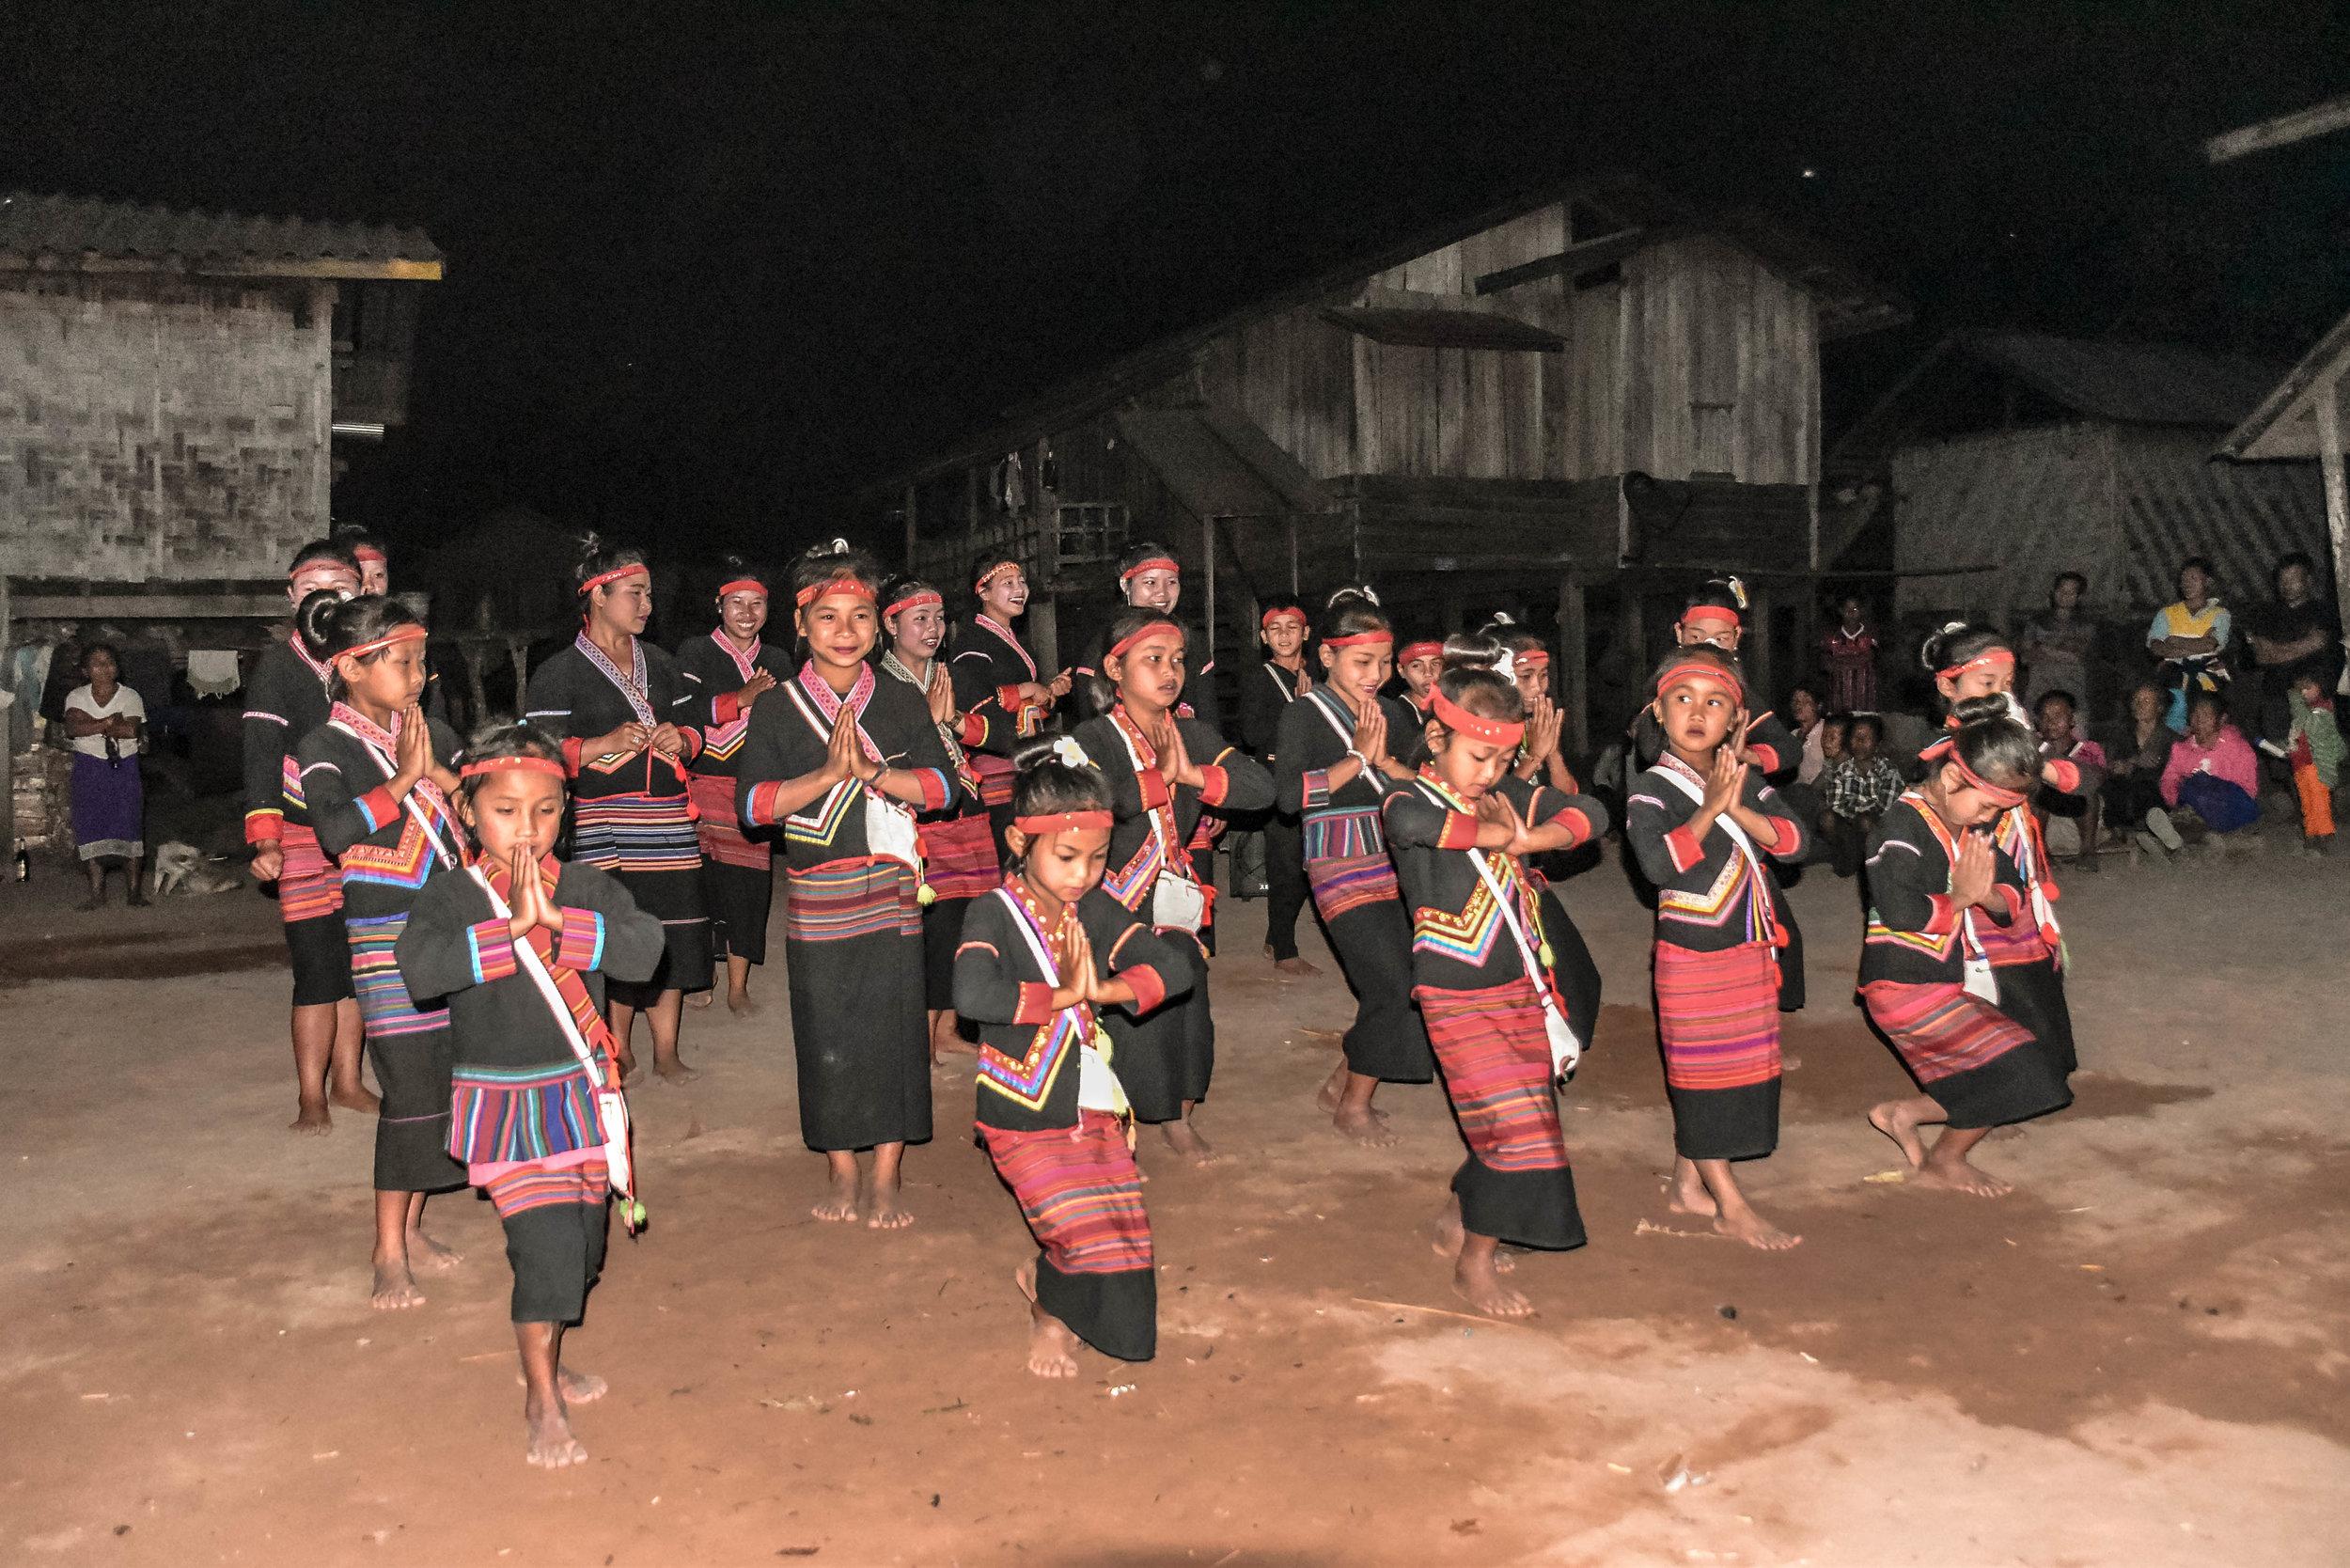 KHMU DANCING